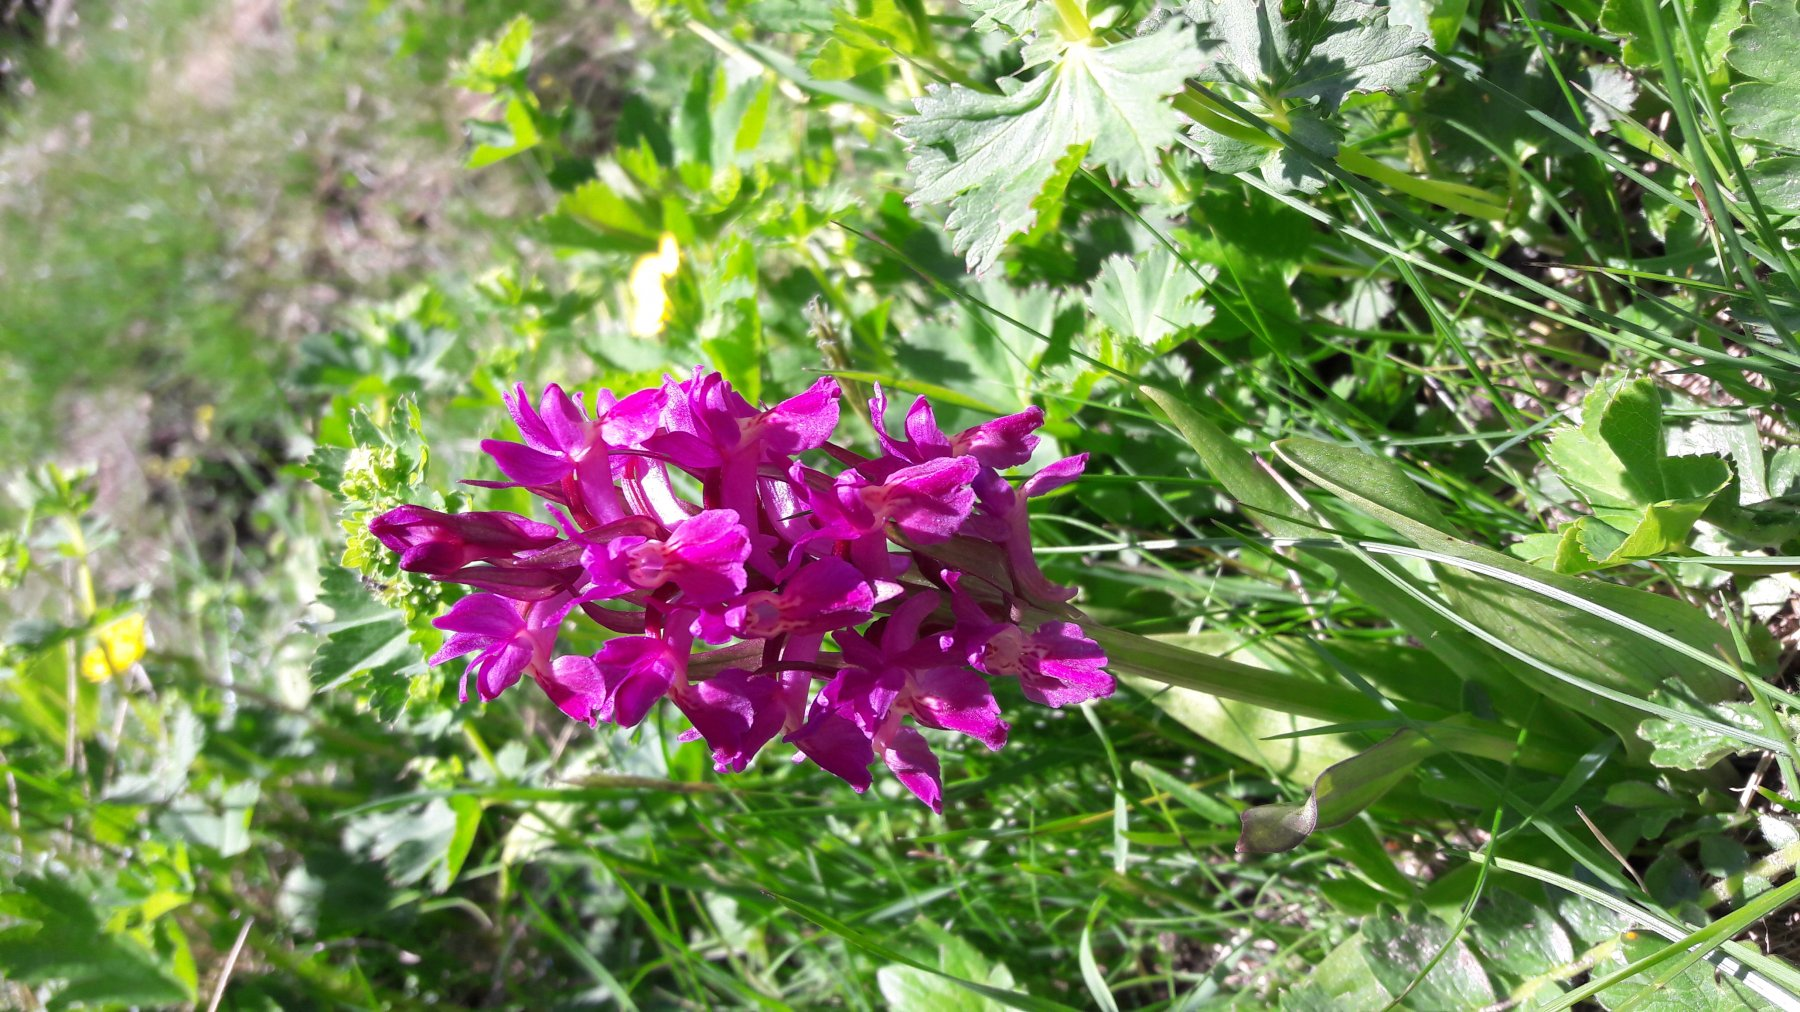 Splendide fioriture